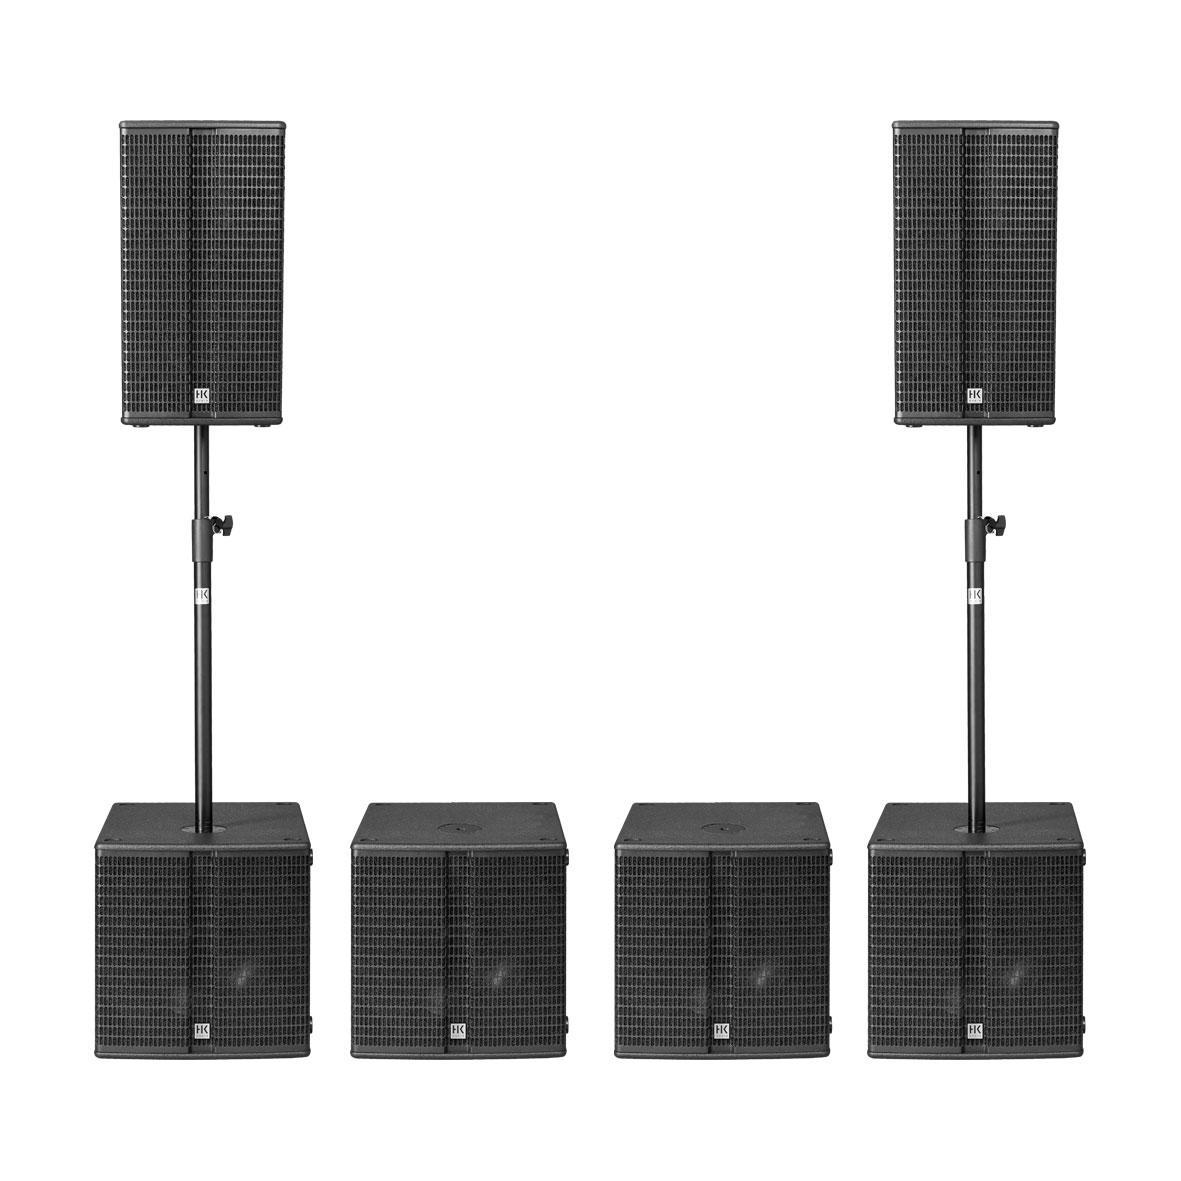 Hk Audio Linear 3 High Performance Sistema de Sonido